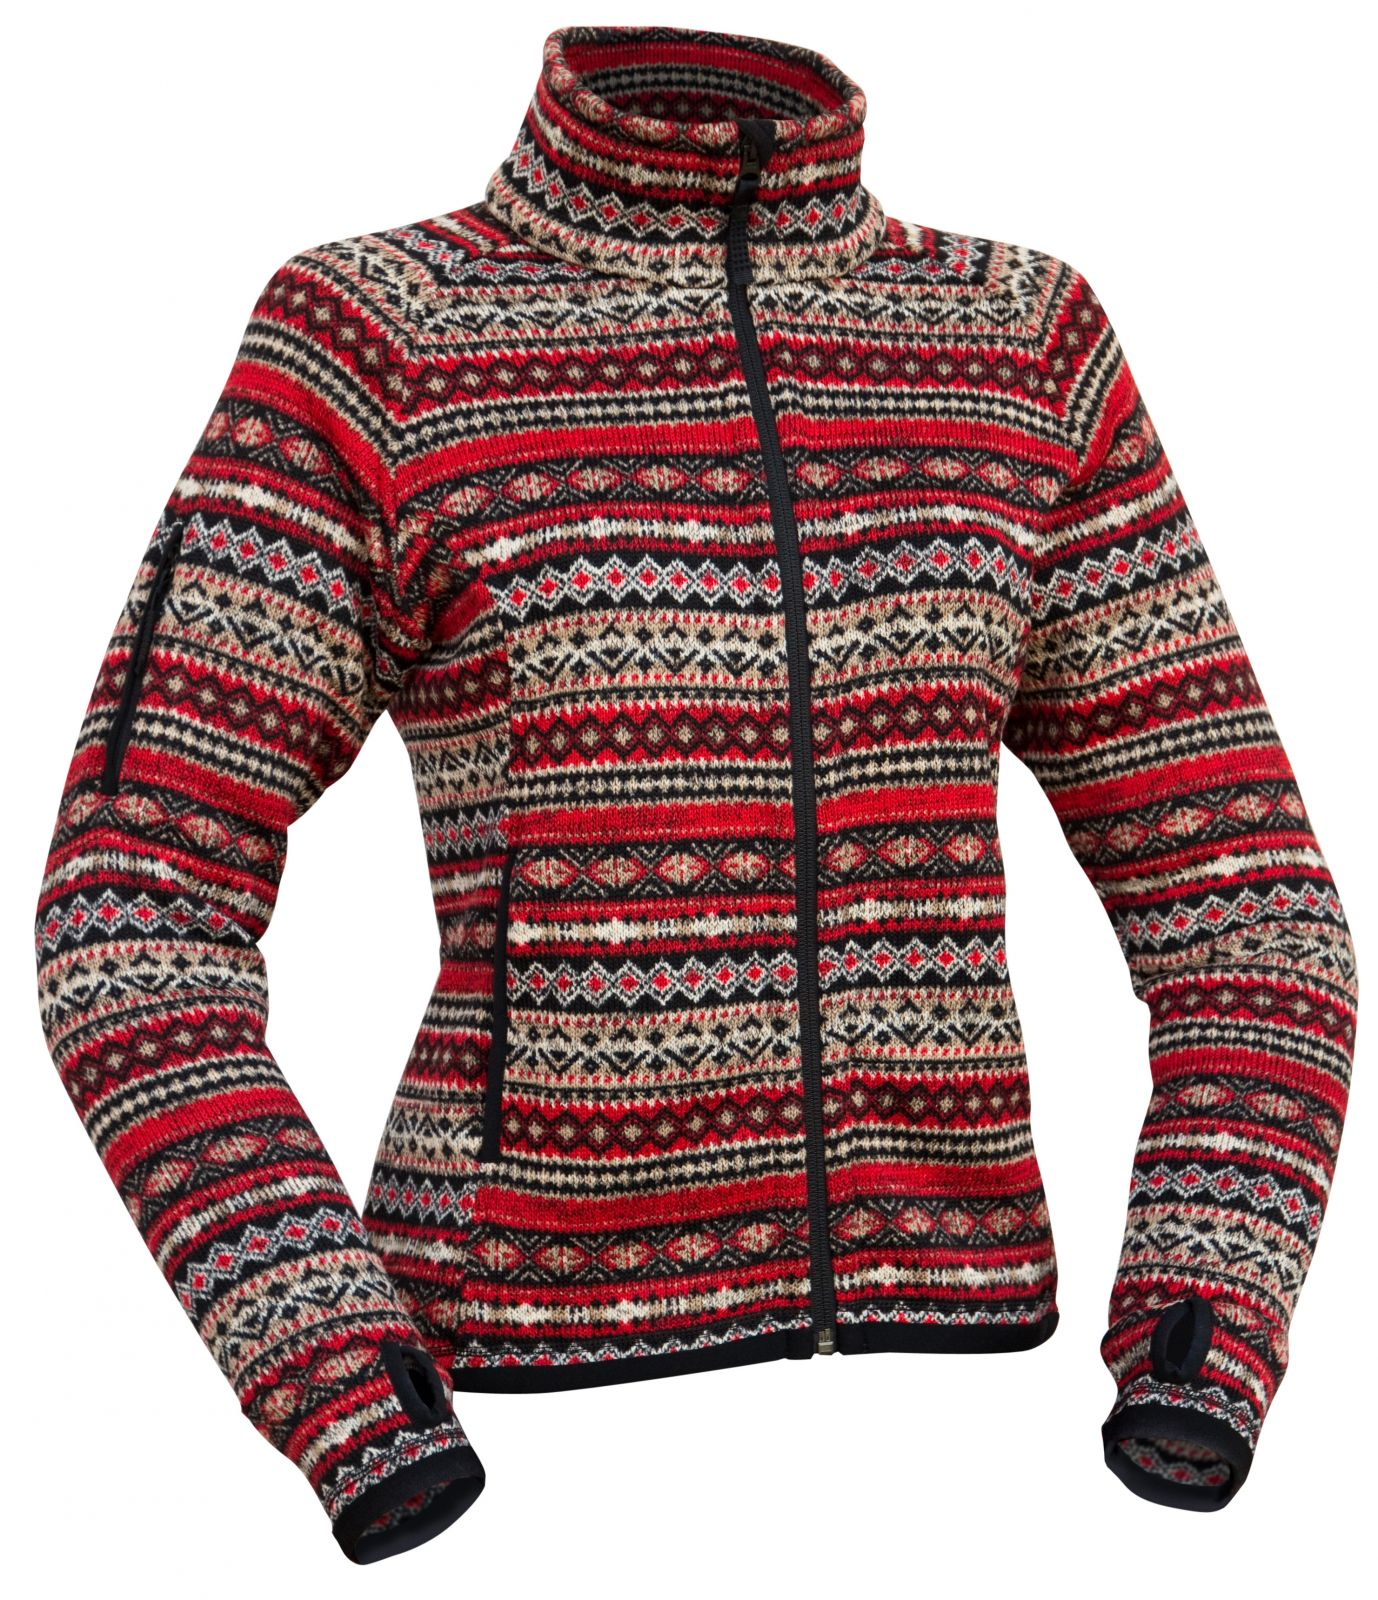 Warmpeace Norwega lady red dámská bunda z fleecového materiálu se svetrovým vzorem